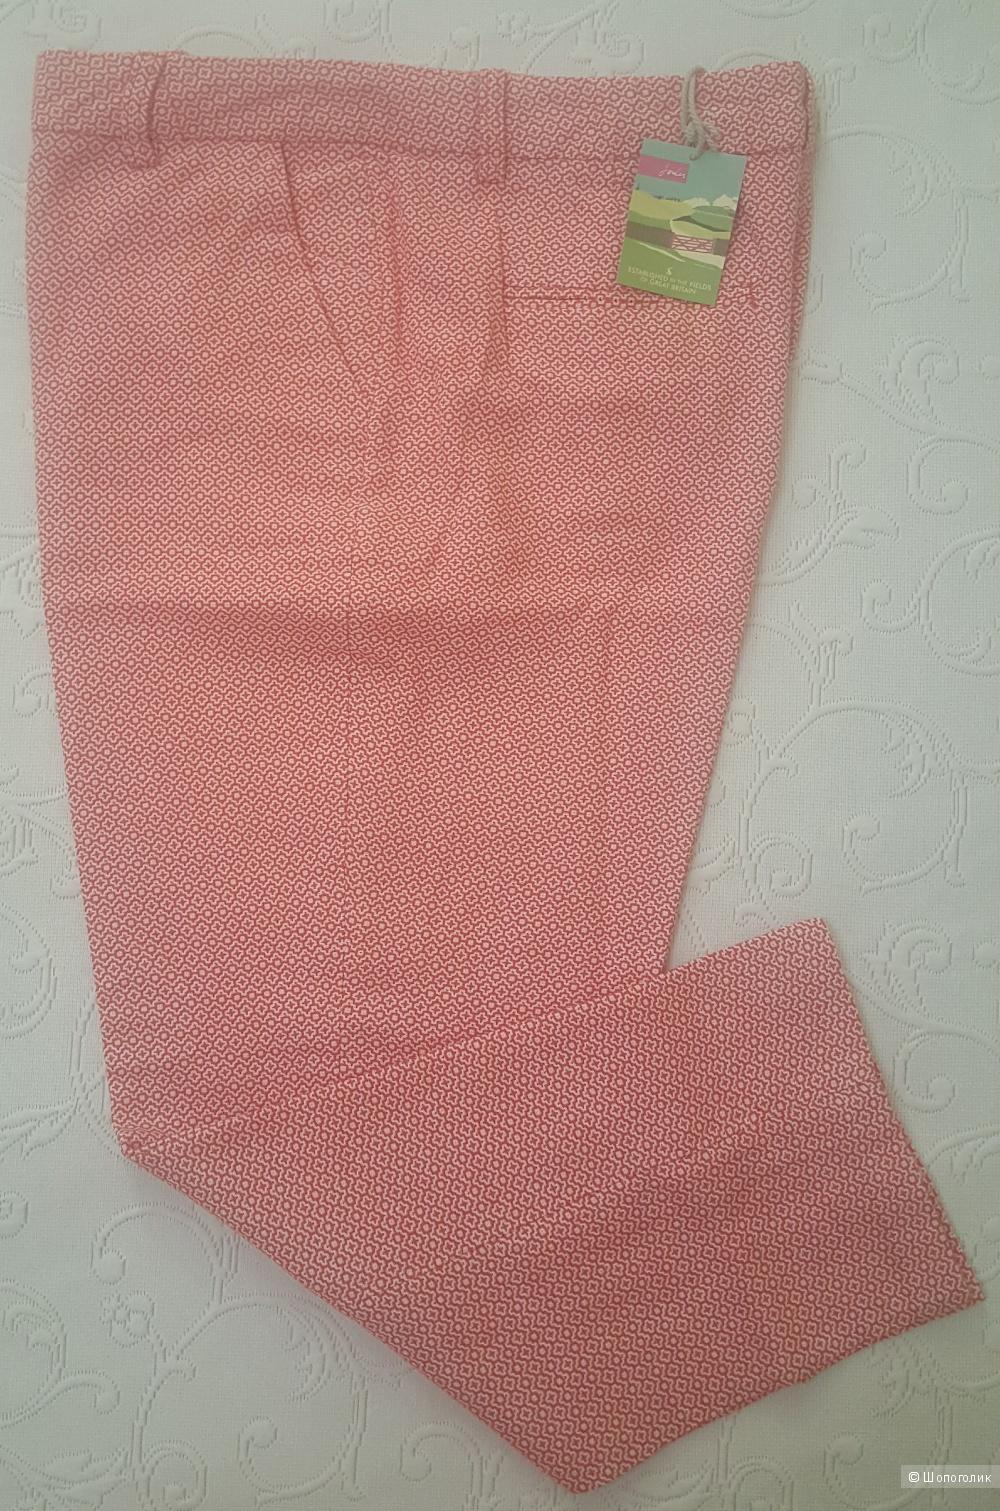 Жаккардовые брюки-капри Joules р. 14 UK (на 48 рос.)